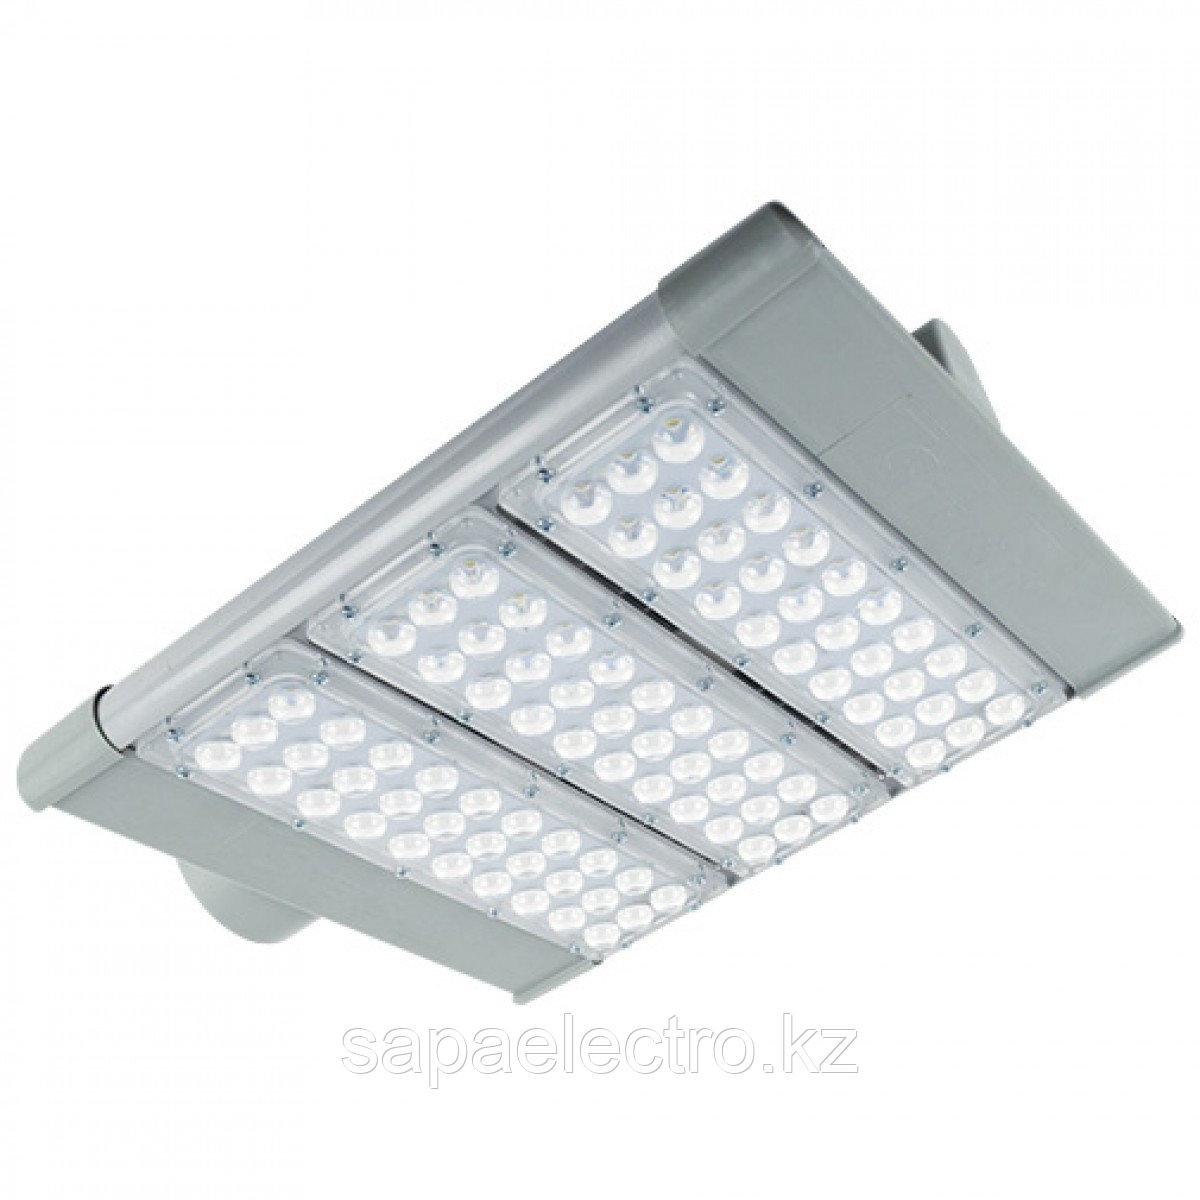 Свет-к RKU LED SMART 1*30W+1*60W (3года гарантия) 6